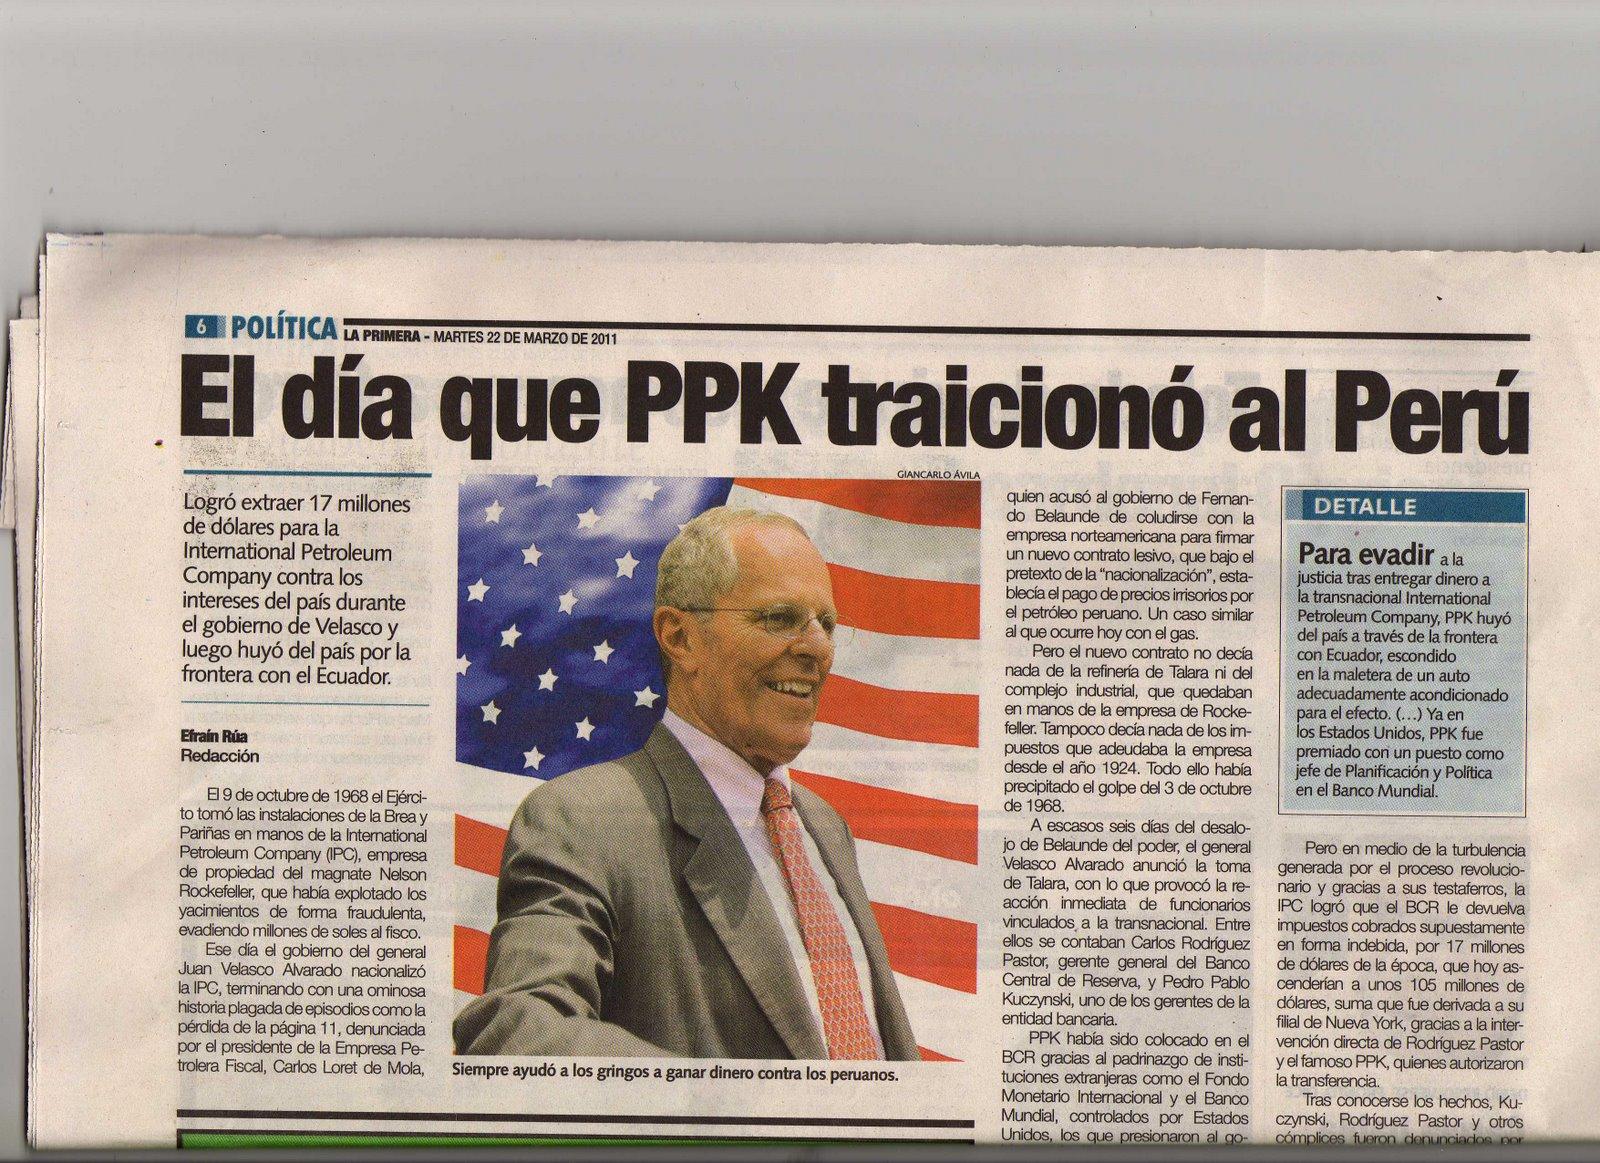 22-marzo-23-24-25...2011  La traicion a Peru de ppk-aka